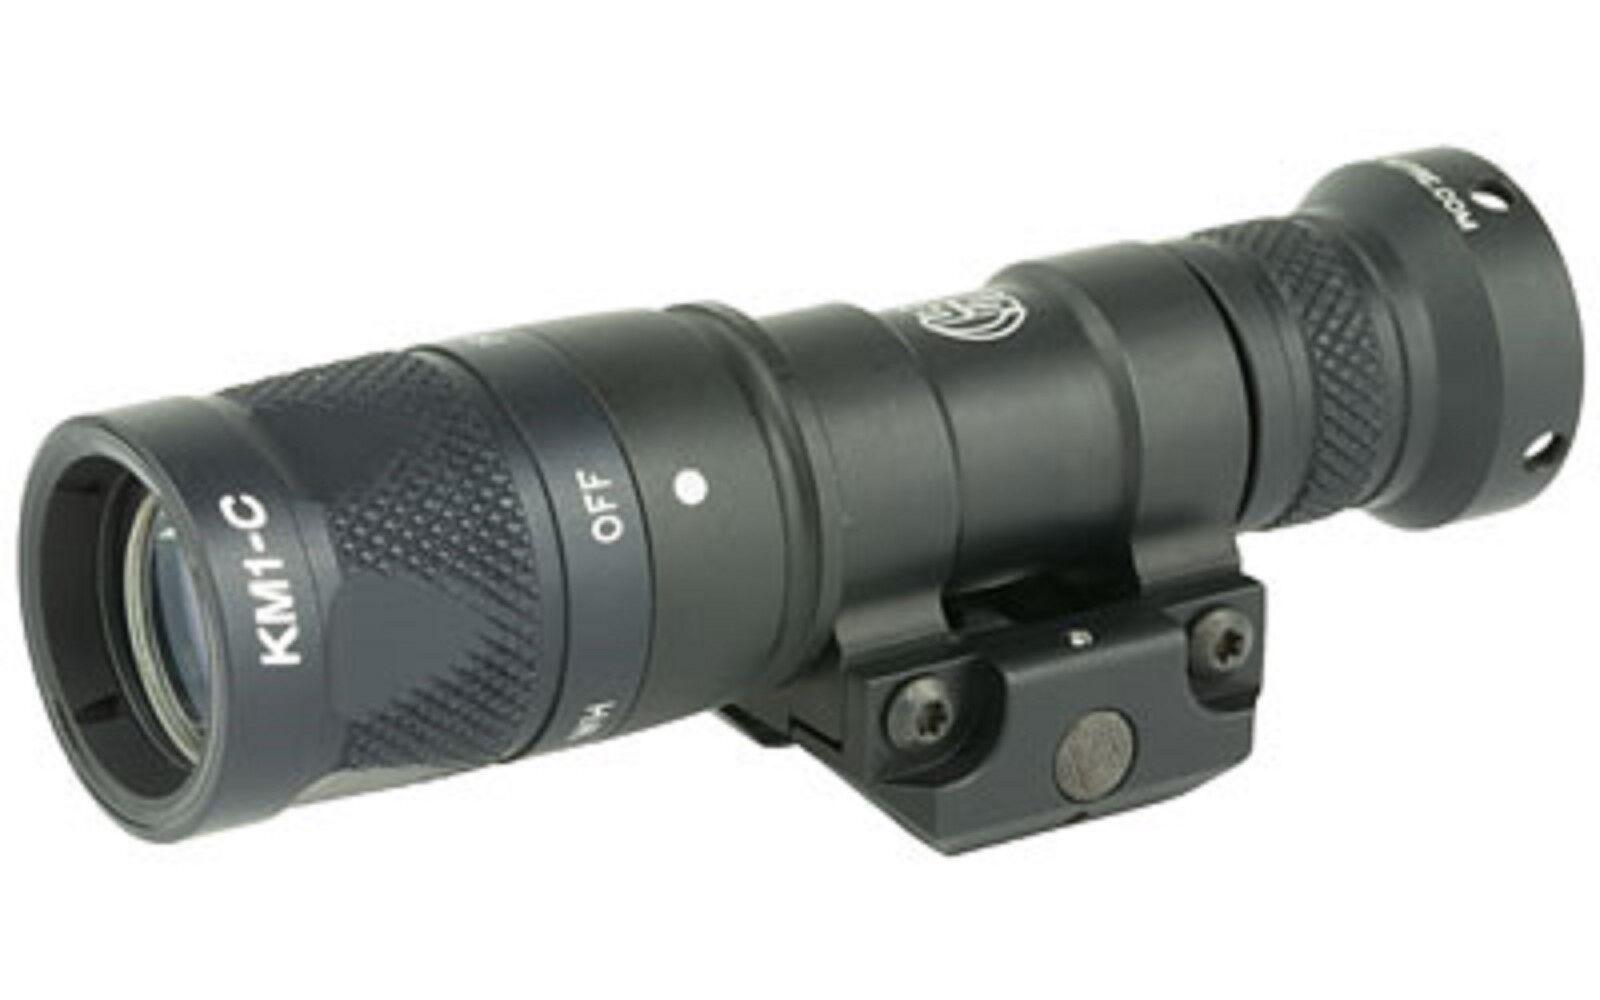 SUREFIRE SCOUT LHT VMPR CLK 250 Lu M300V-B-Z68-BK